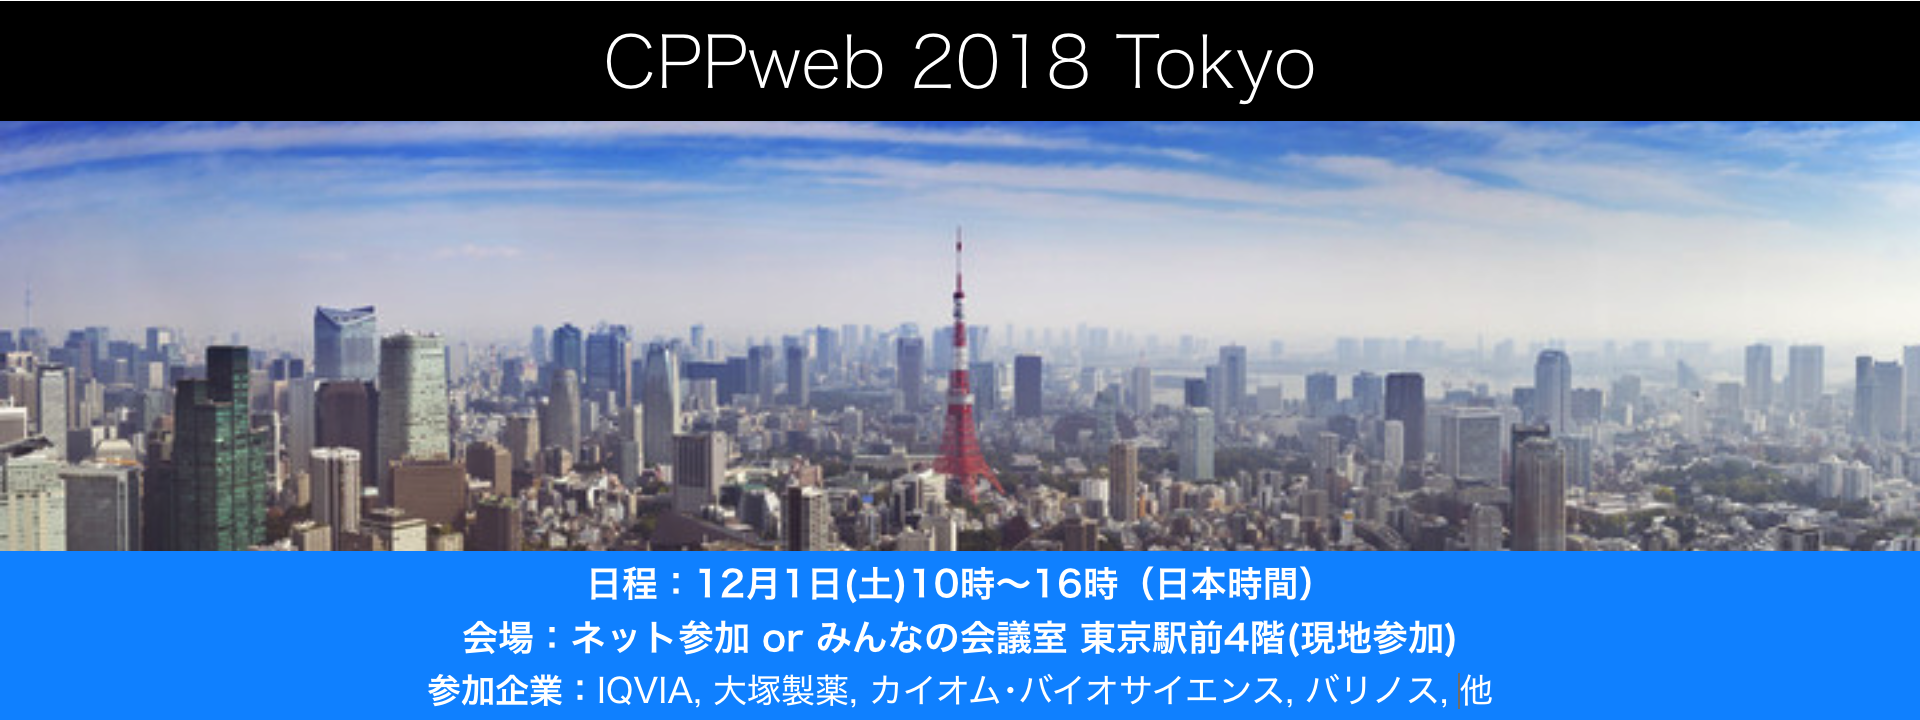 CPP2018Tokyo